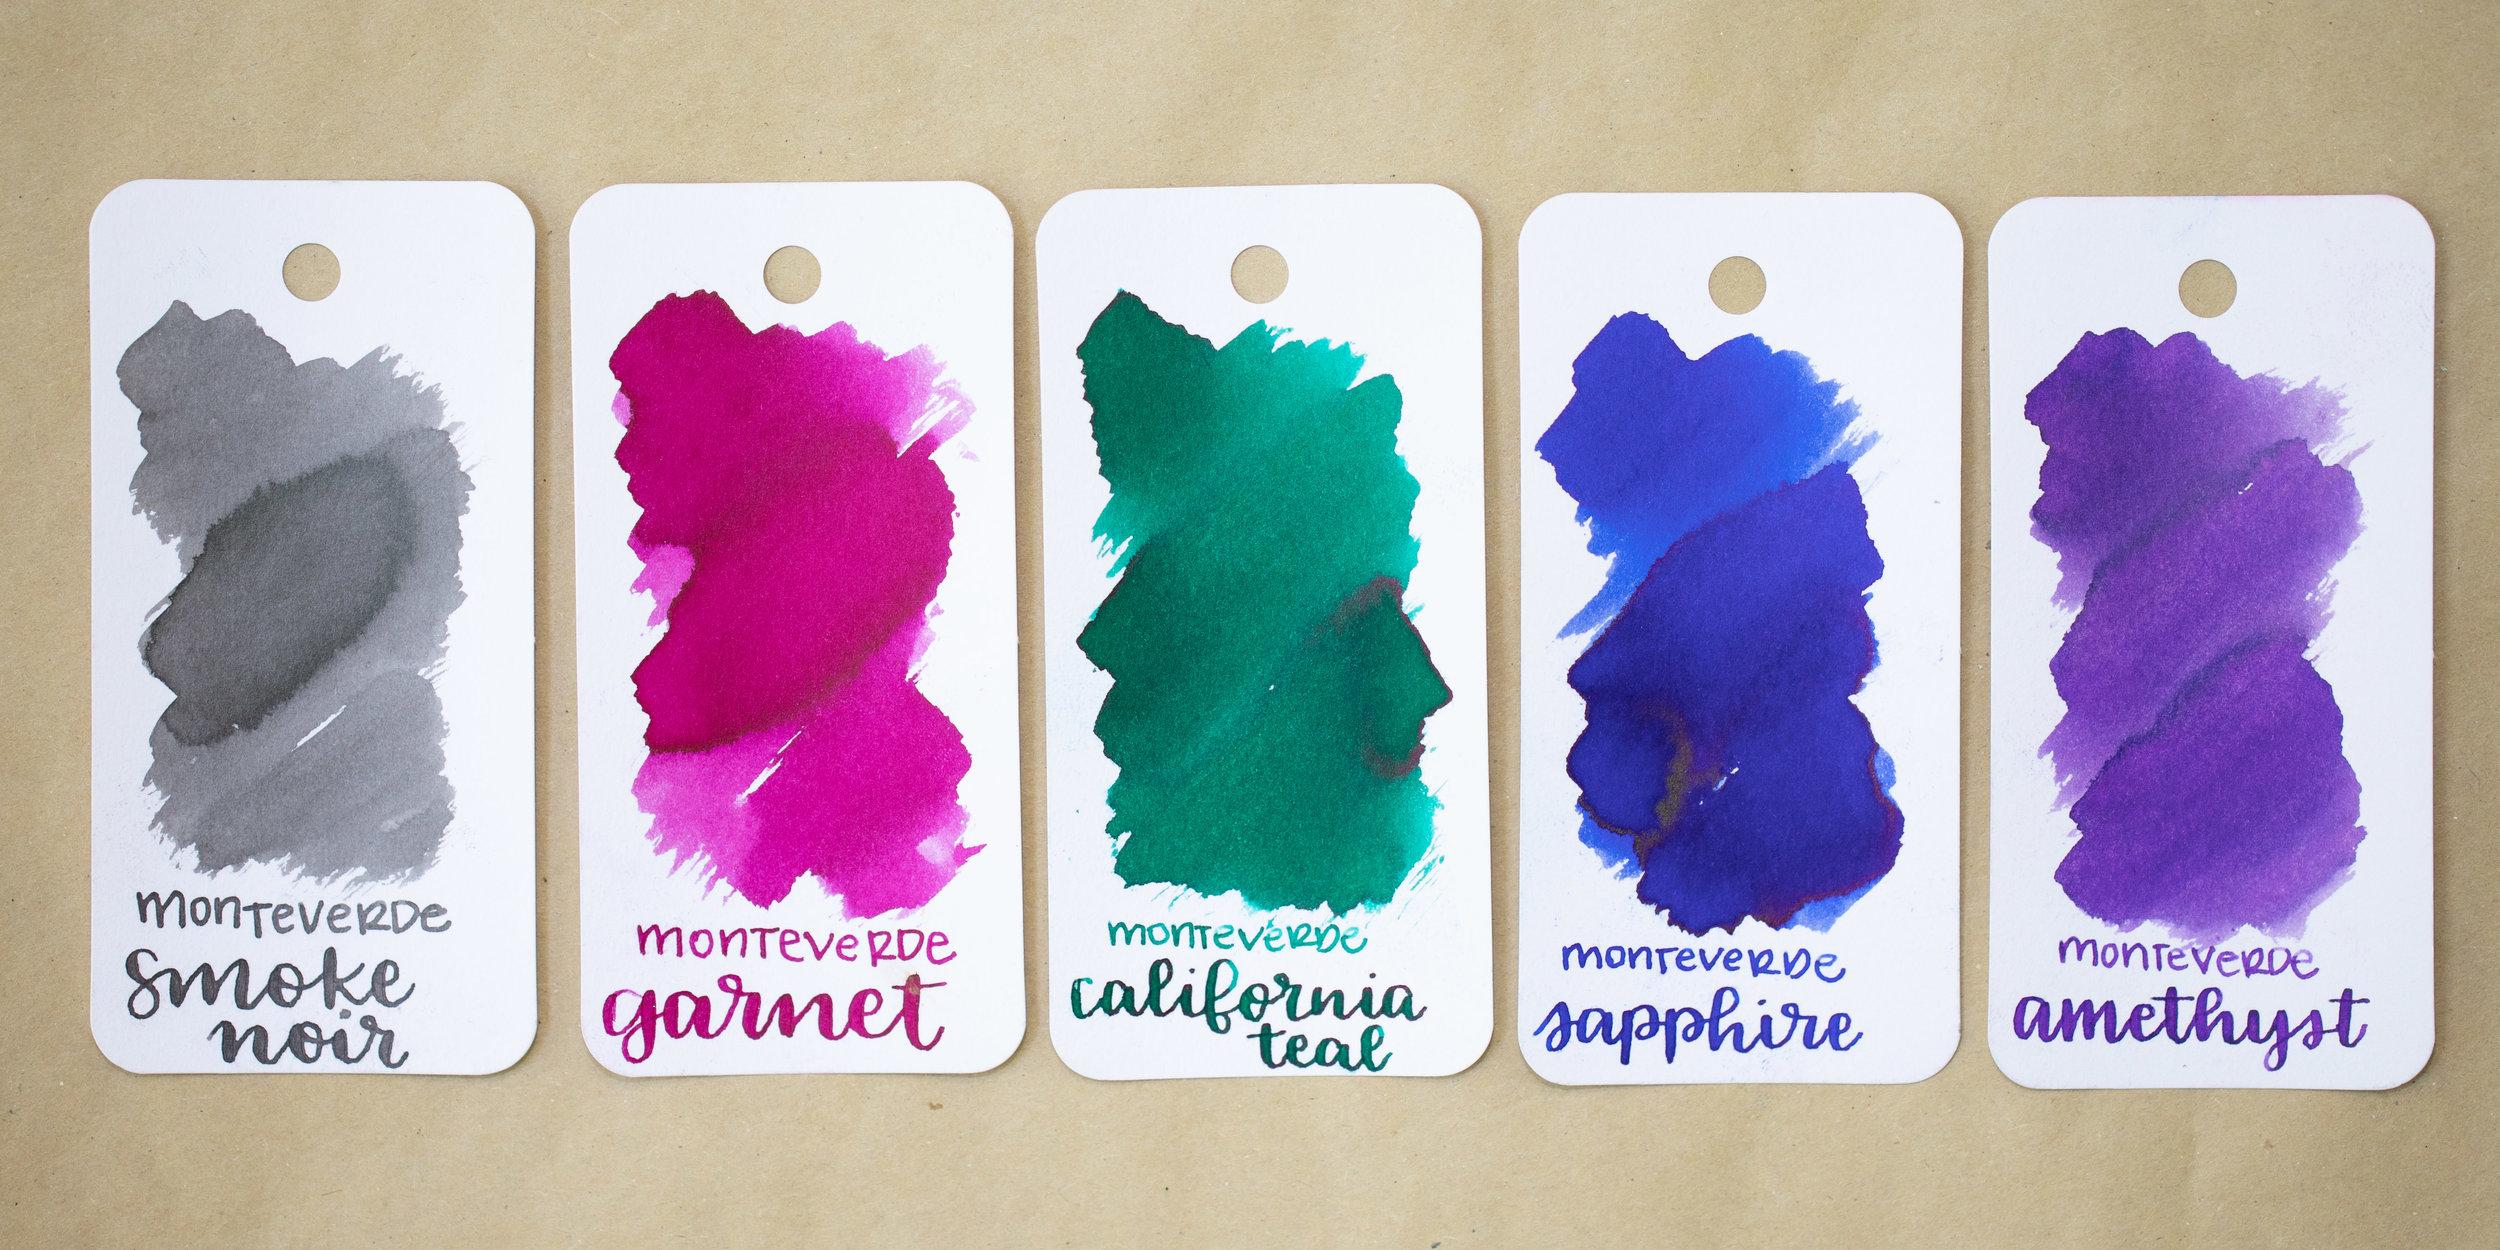 ink-brands-1-3.jpg